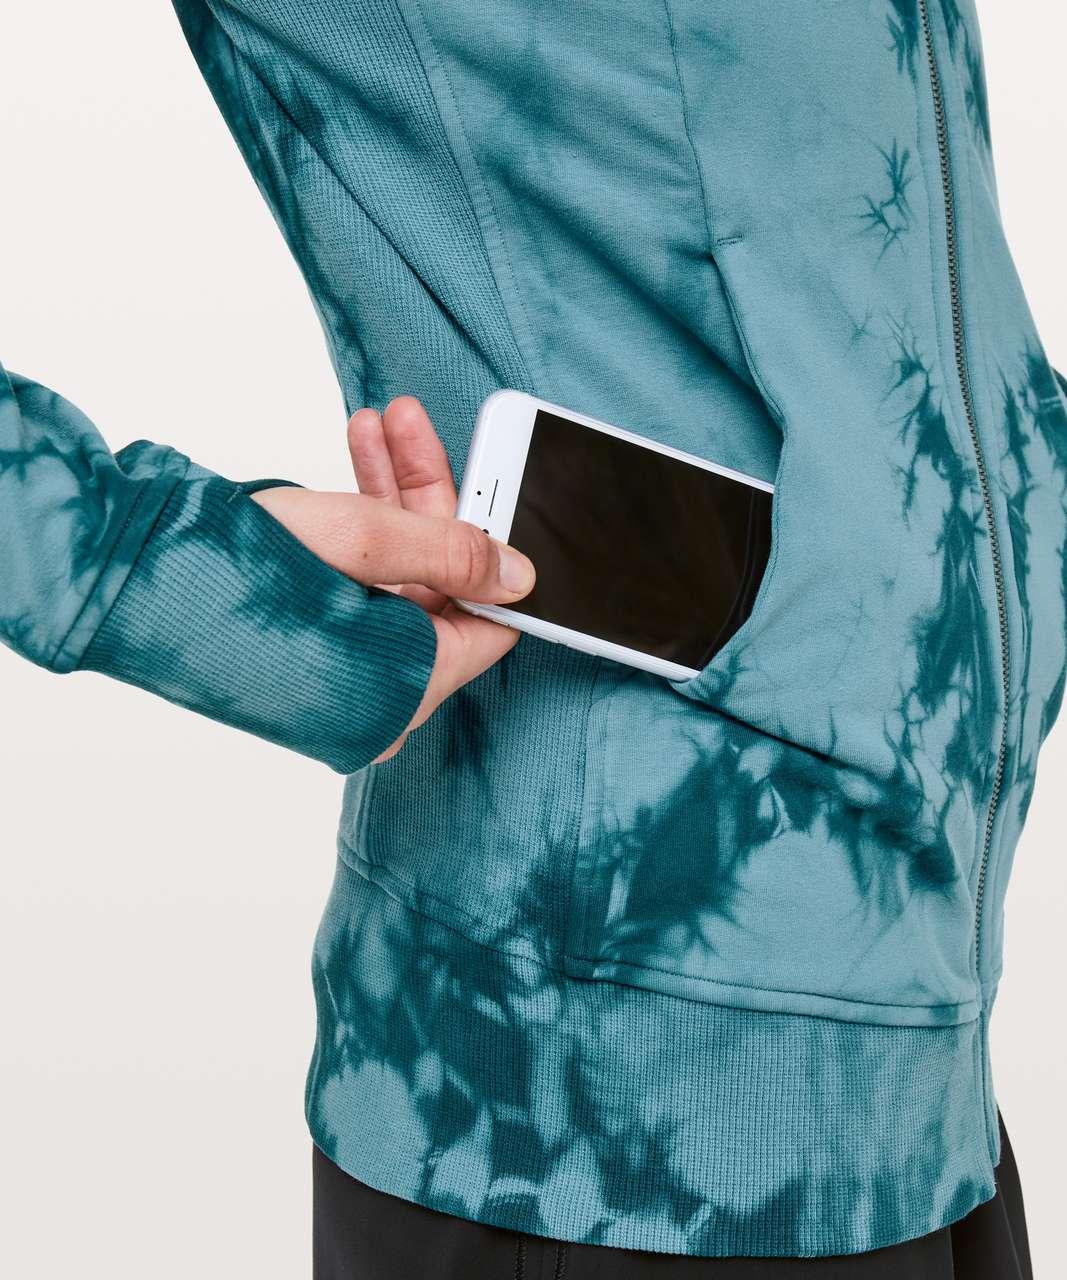 Lululemon Scuba Hoodie *Light Cotton Fleece Shibori - Shibori Slate Blue Jet Blue